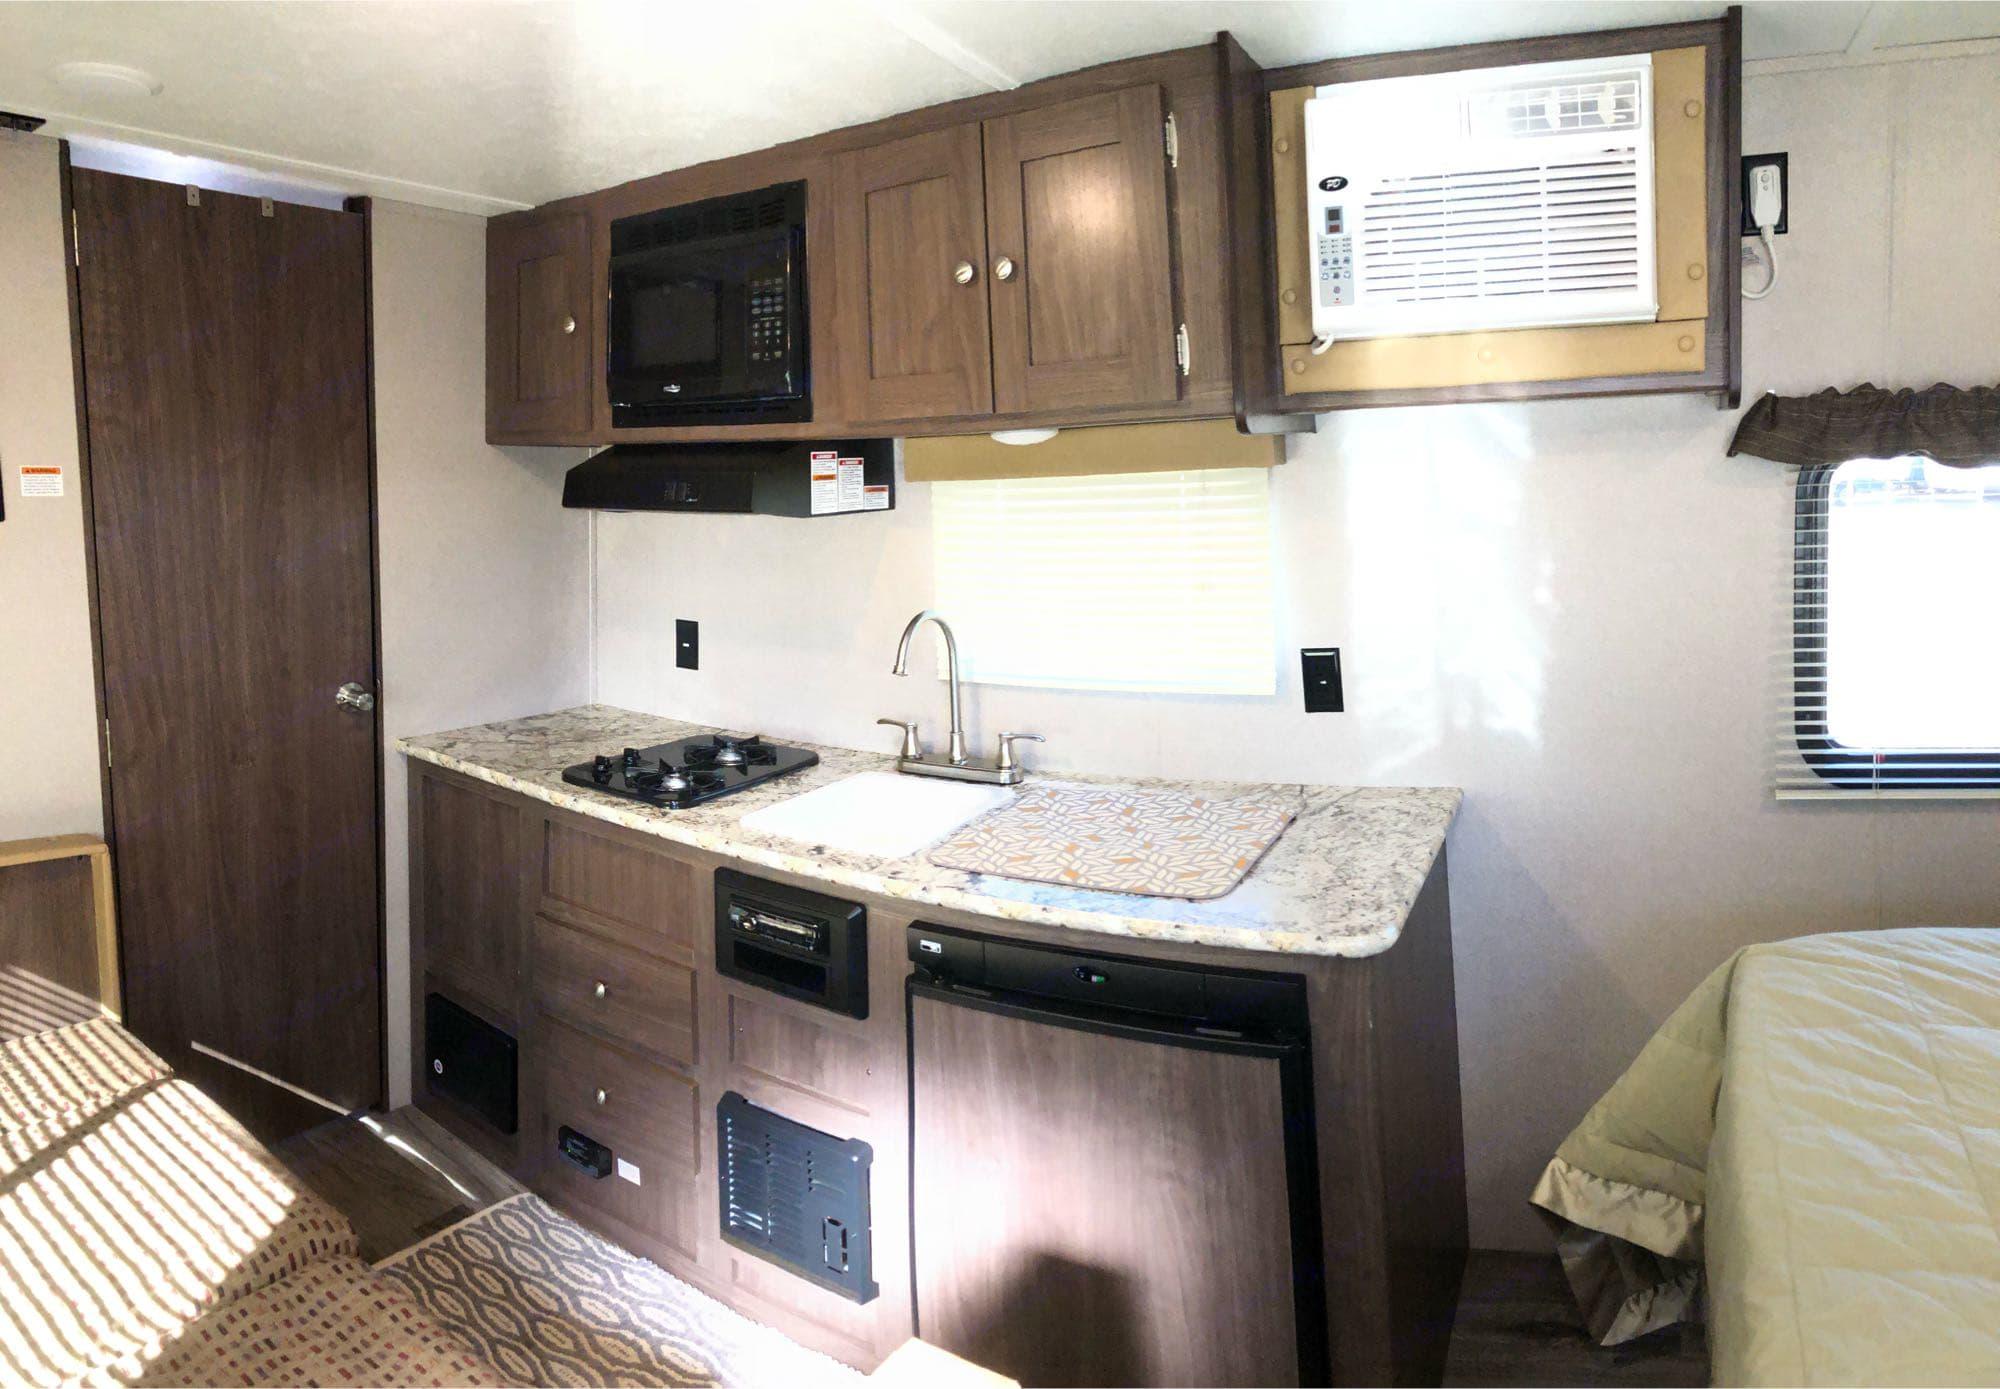 Kitchen Area, 2 stovetop burners + small fridge/freezer.. Keystone Hideout 2019